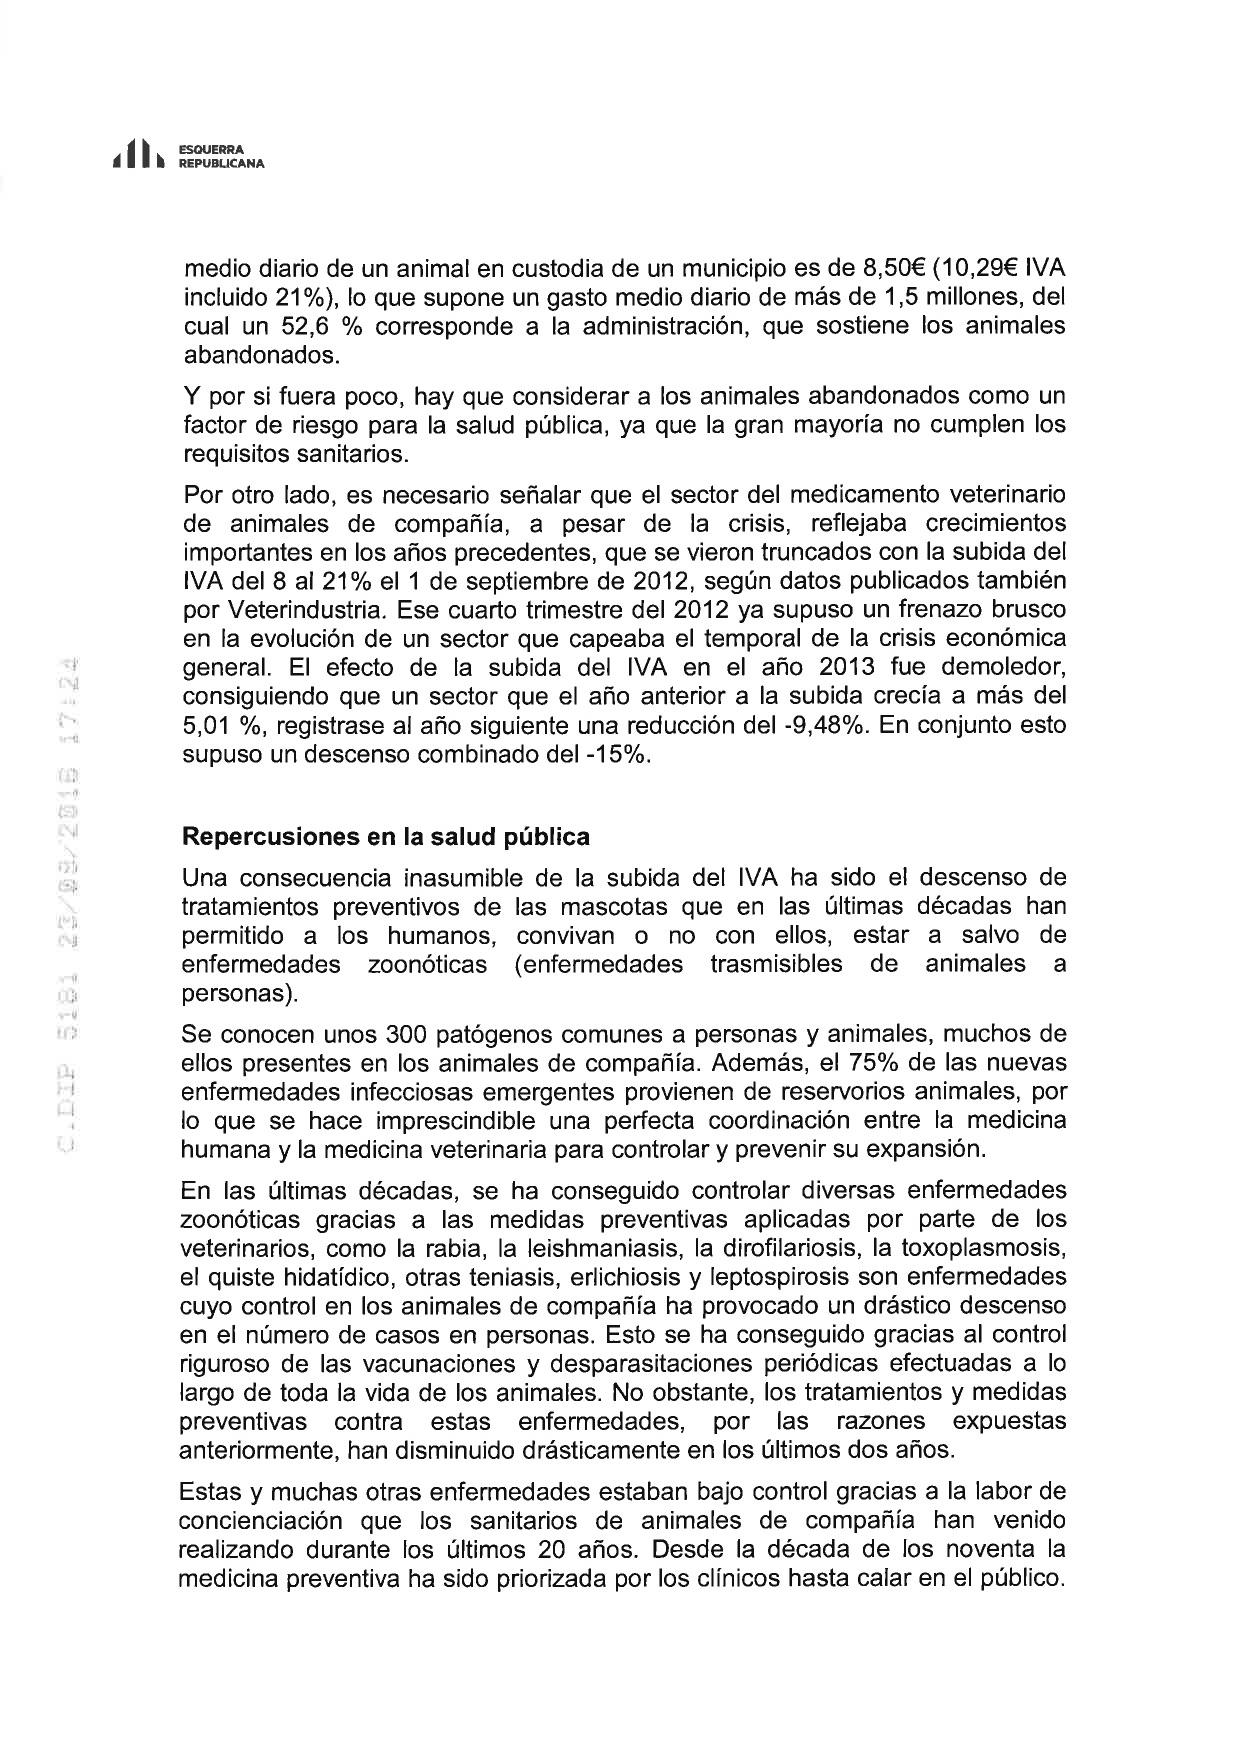 2016-09-23-pnl-pleno-3iva-veterinario